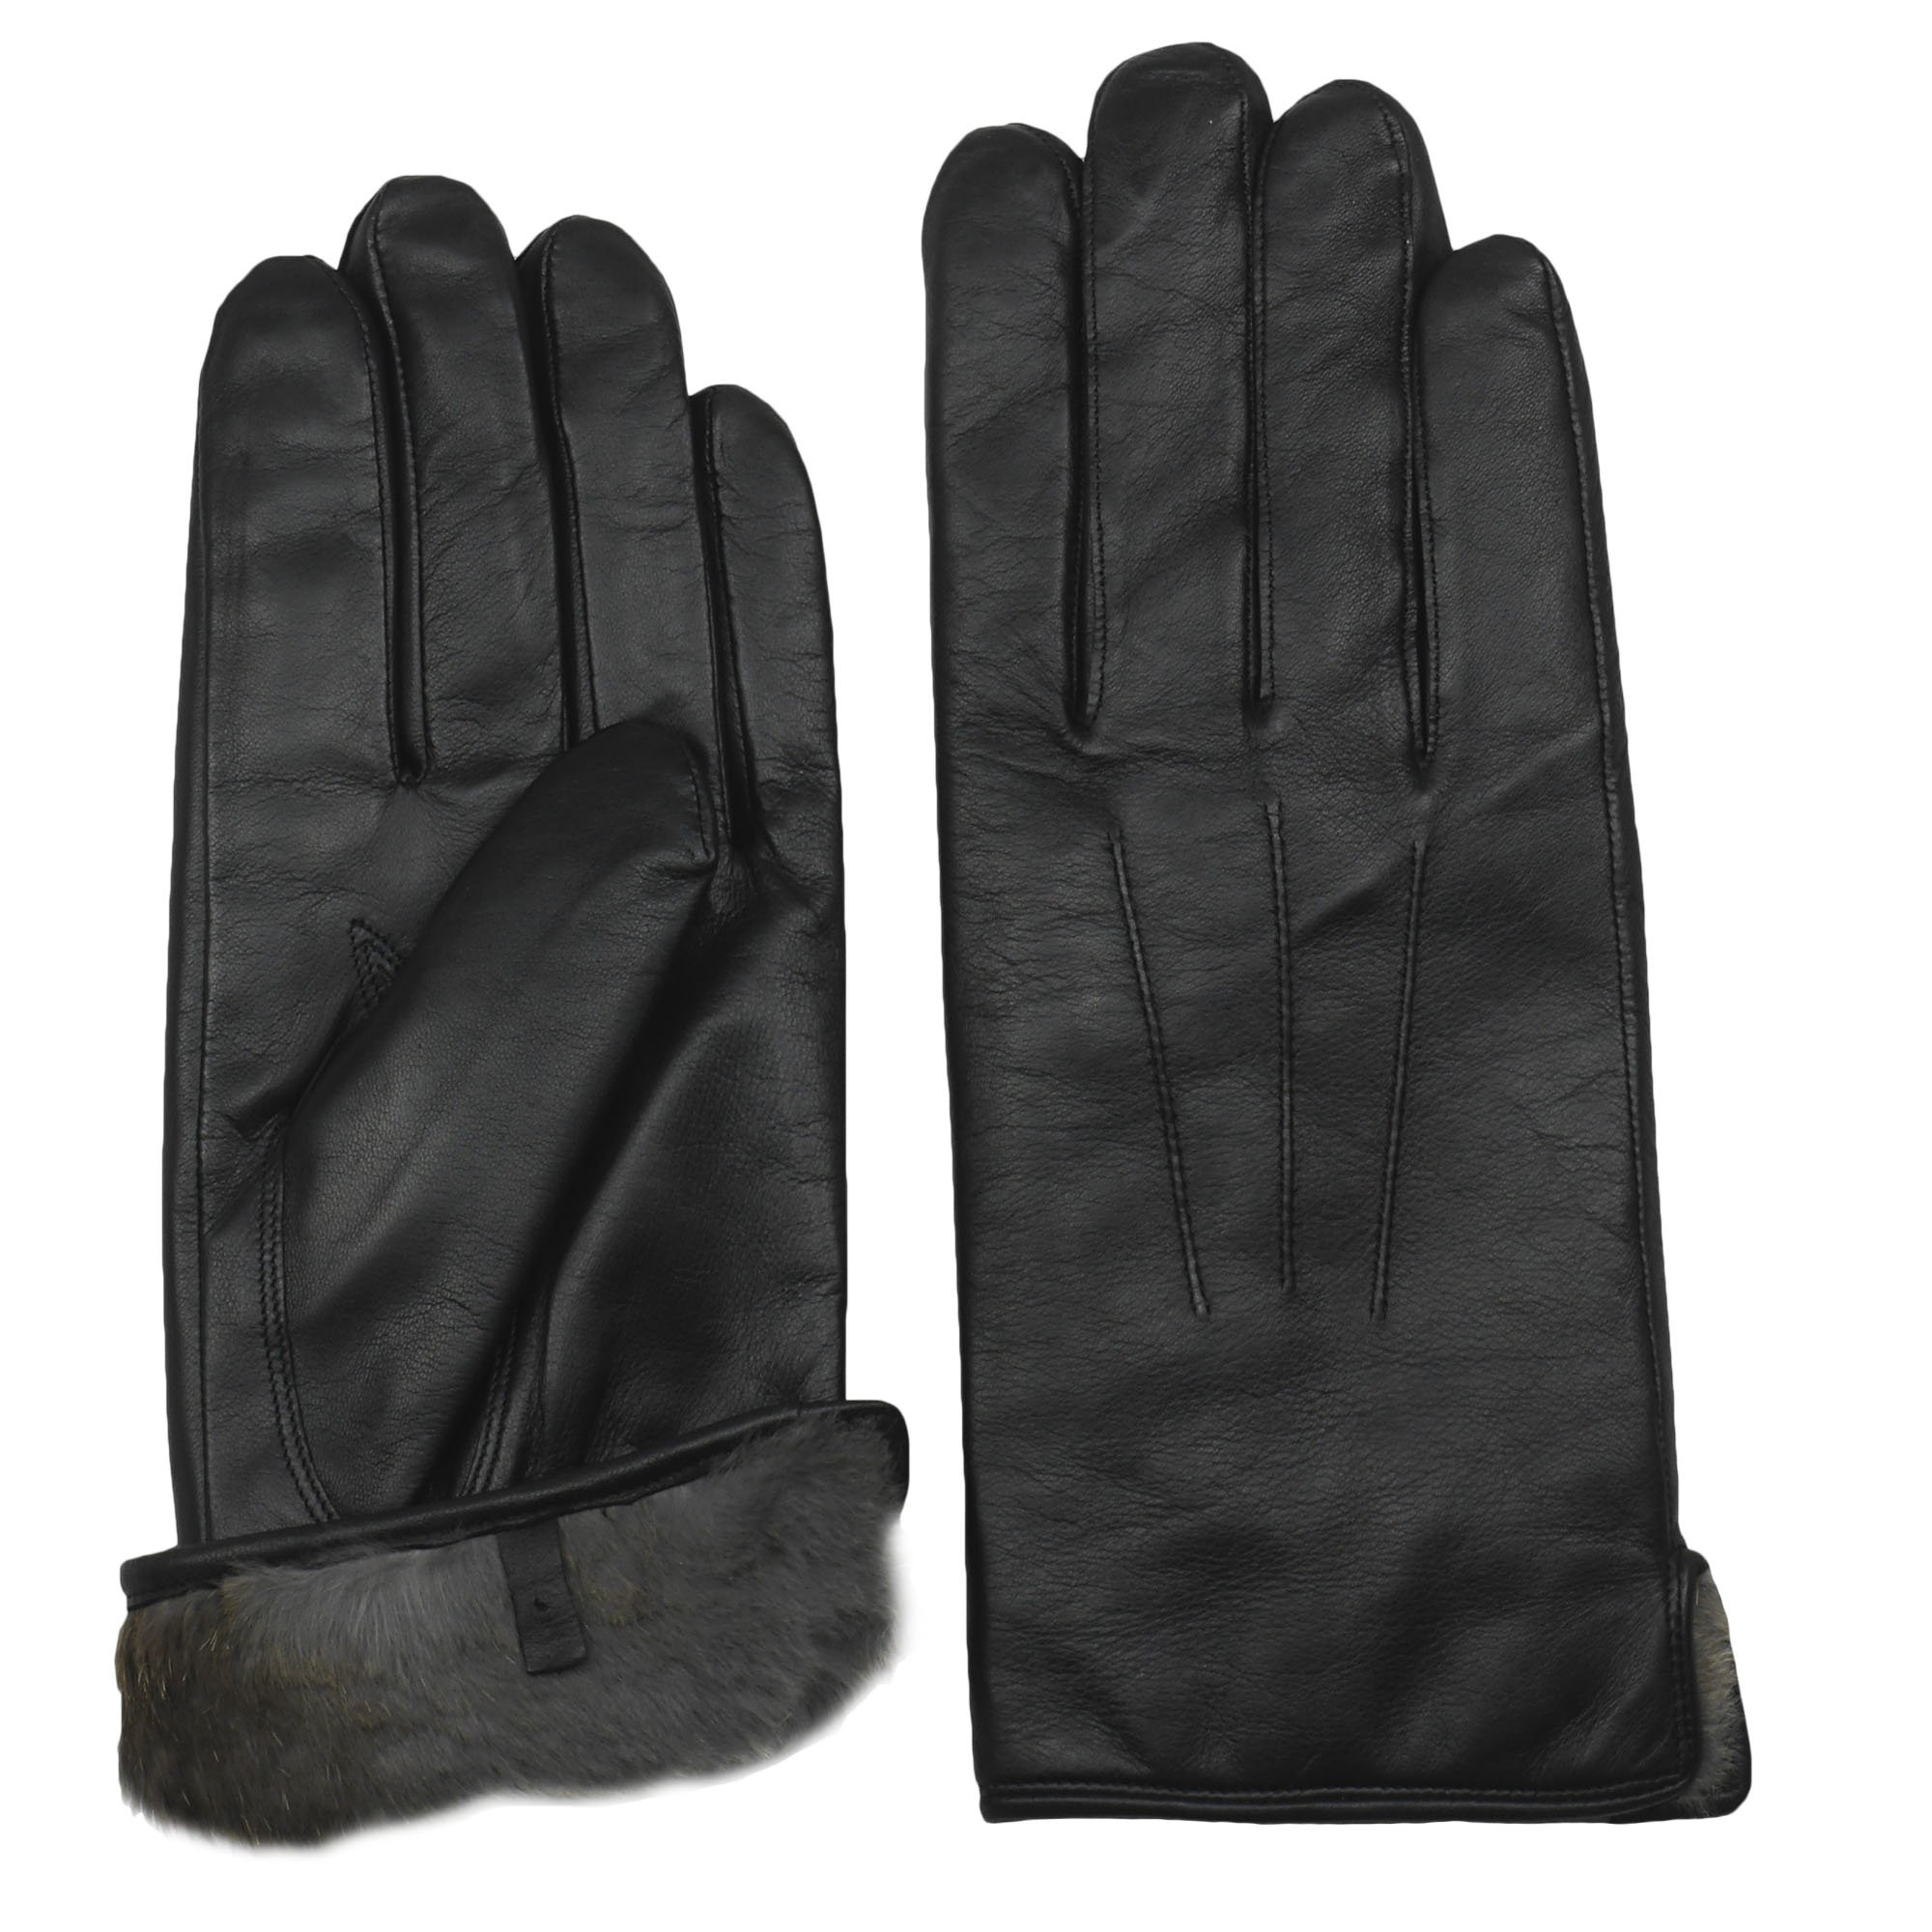 Men's Rabbit Fur Lined Sheepskin Leather Gloves by Arosa | Butter Soft Luxurious